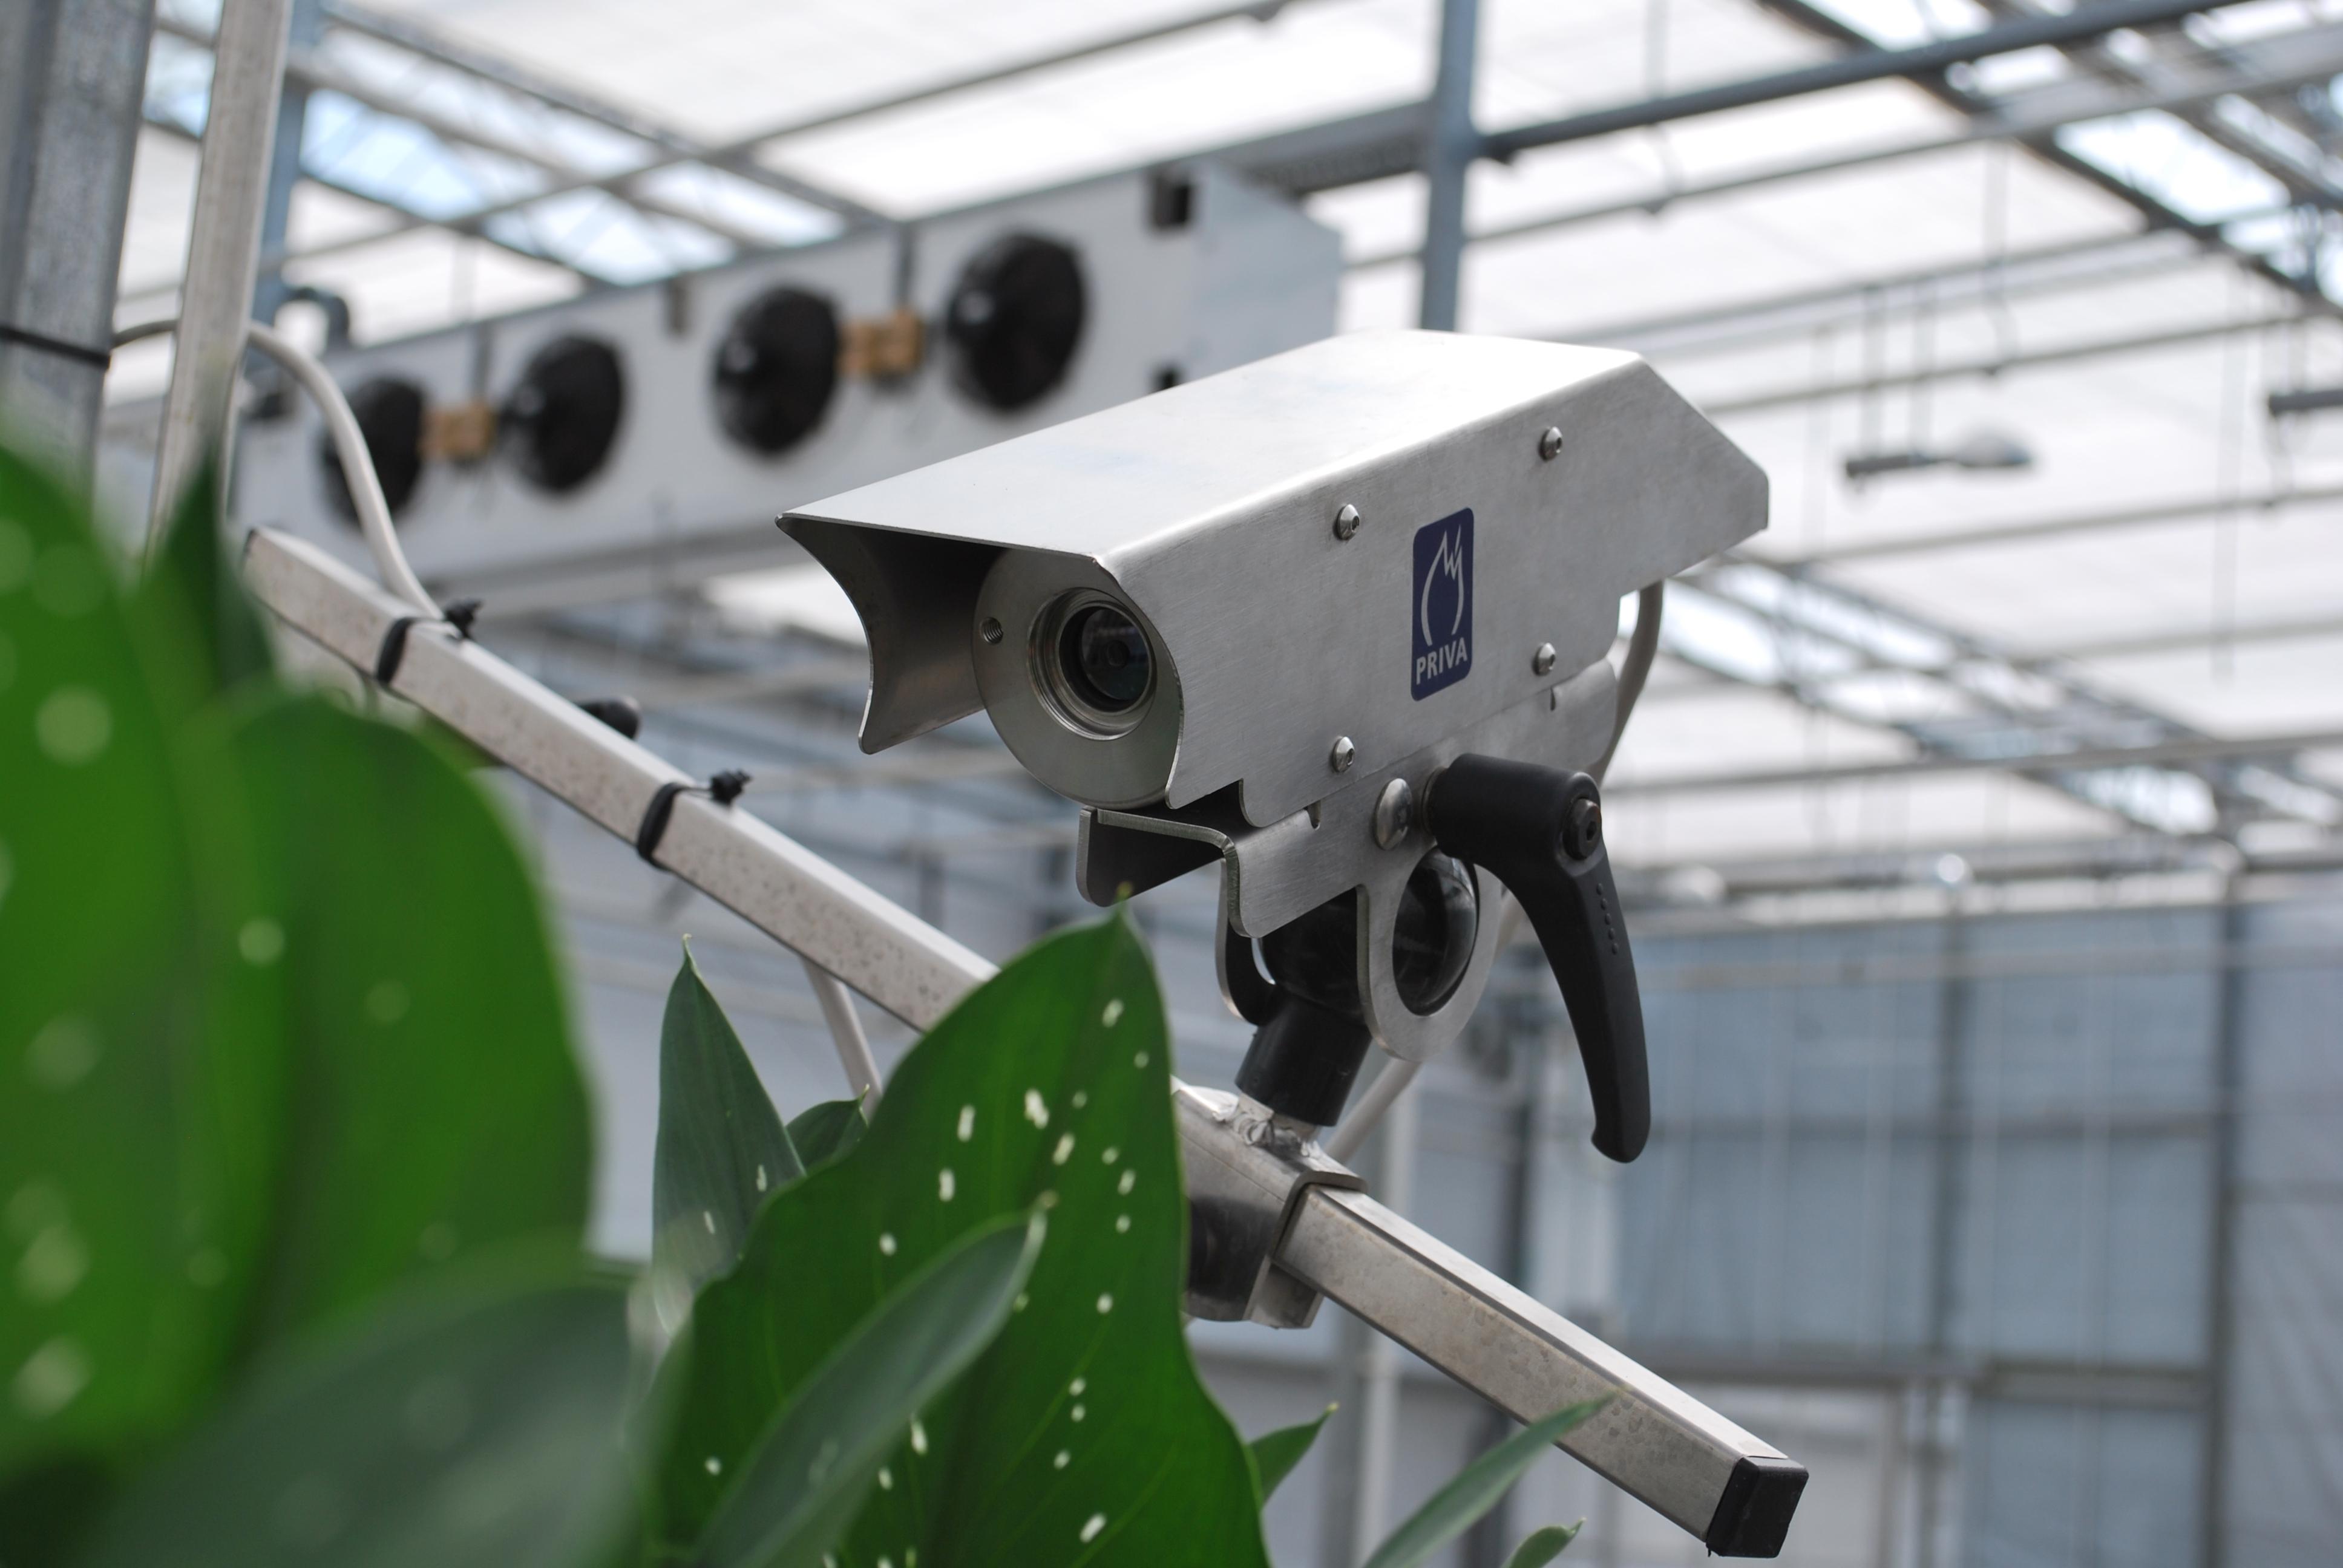 Priva Topcrop Monitor 作物监测系统(北京普瑞瓦国际贸易有限公司) 照片